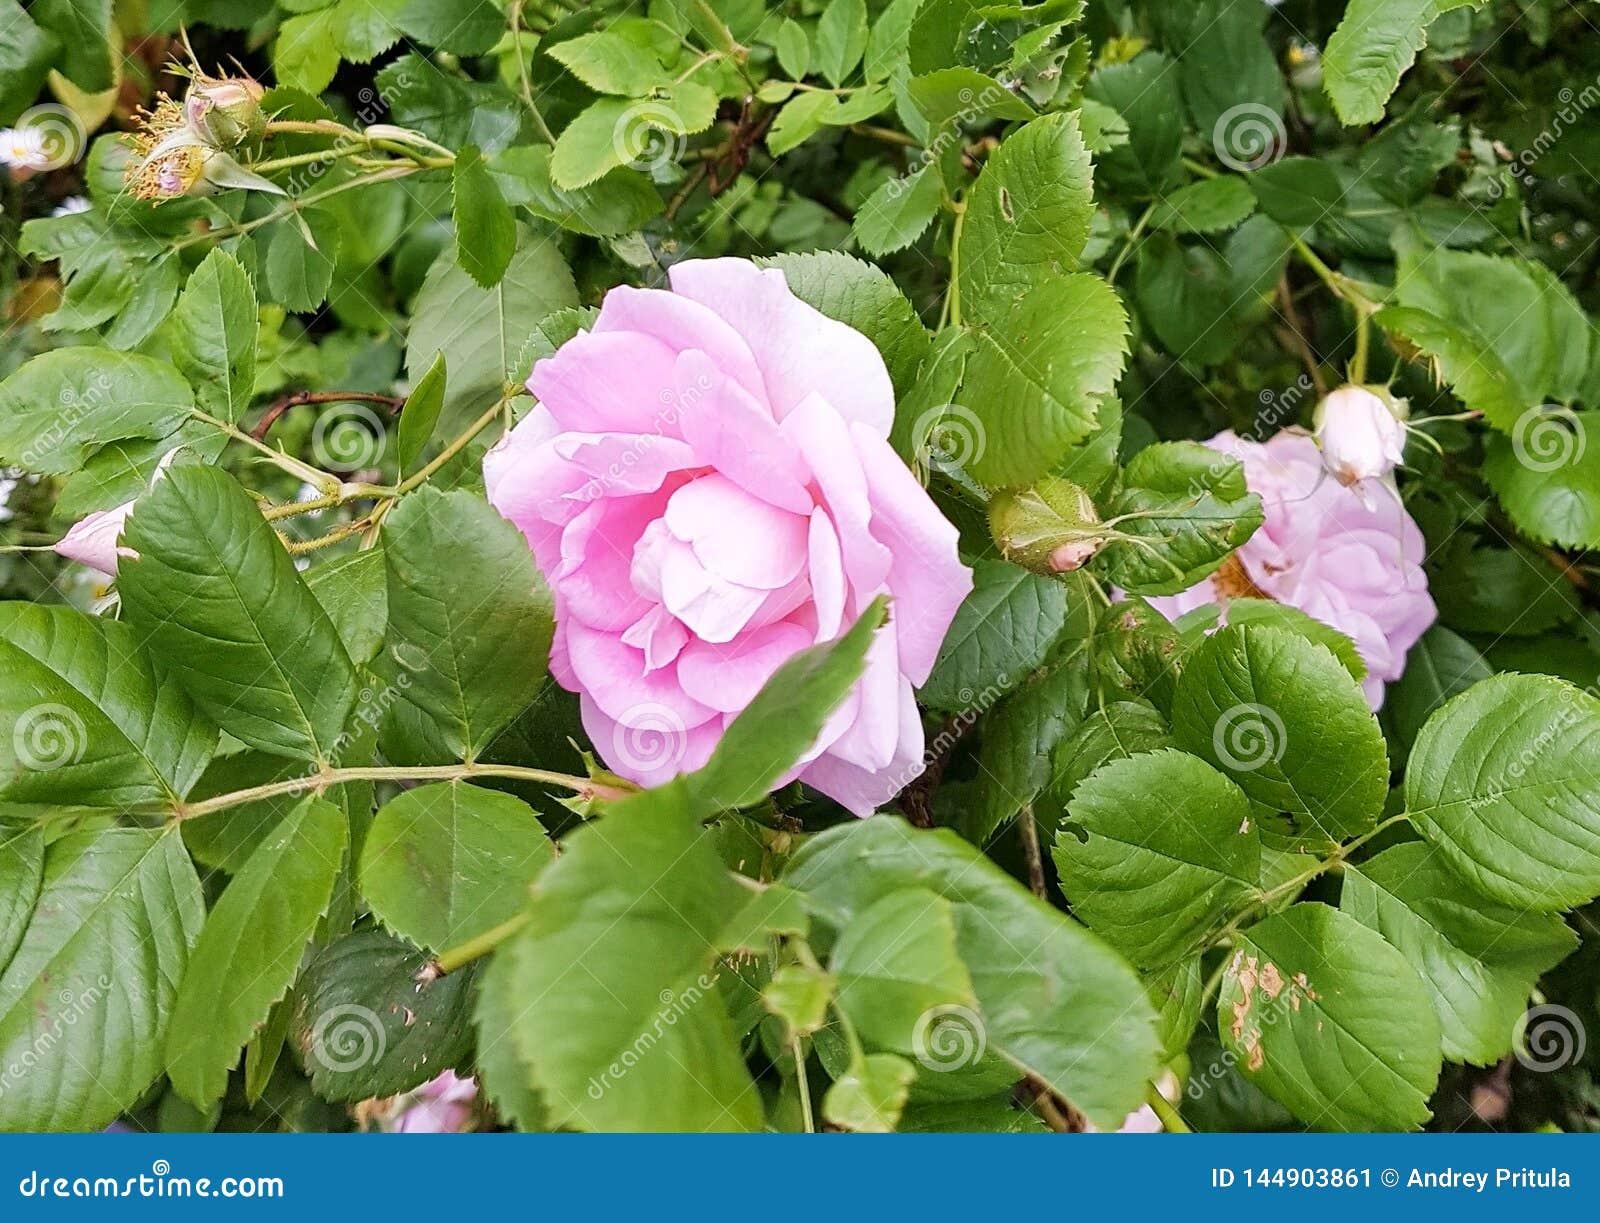 Bush pink rose in summer